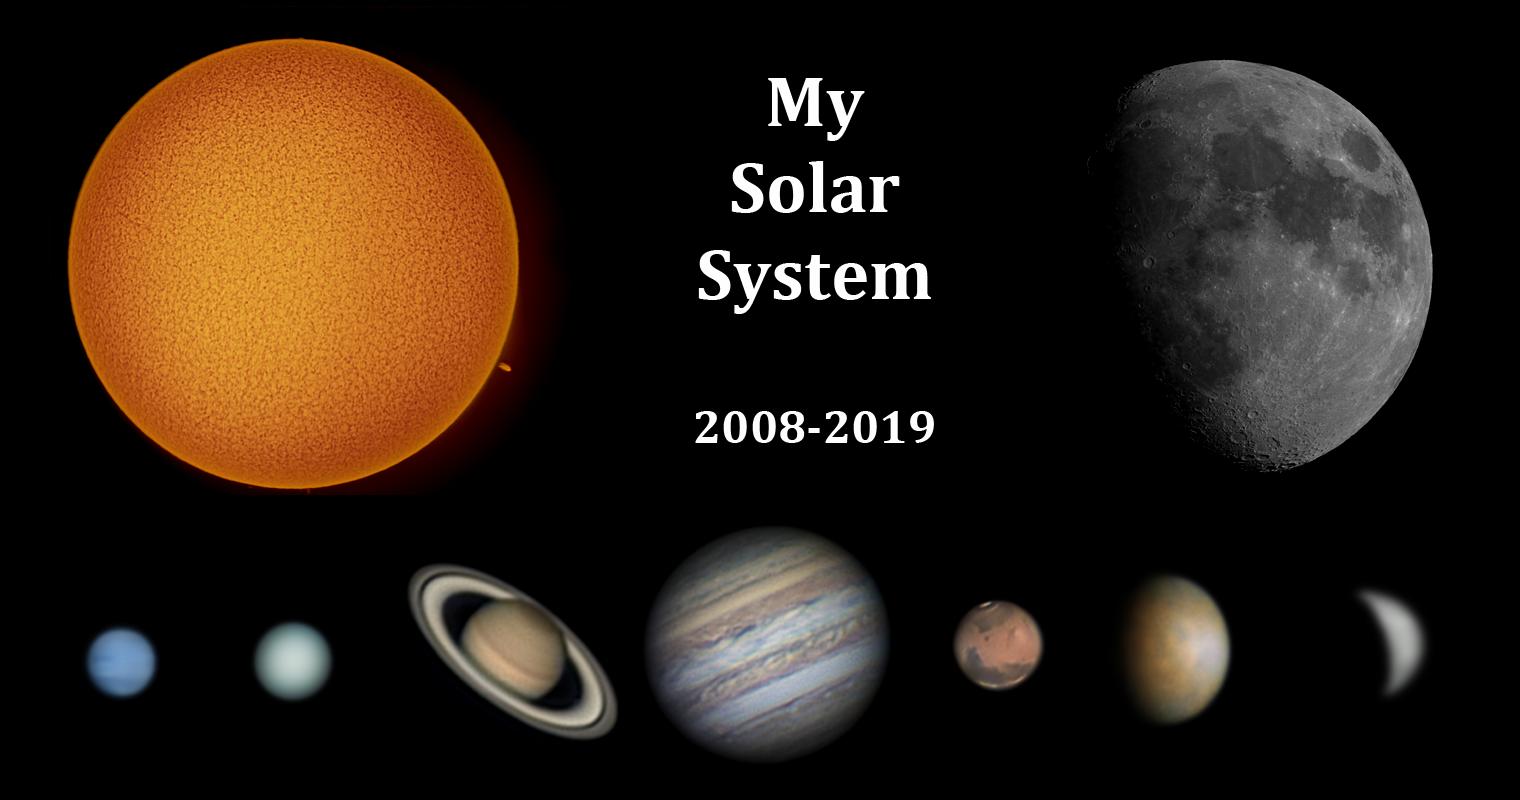 215570102_MySolarSystem2008-2019.png.9928bb45193b6bdb7851f0c4b10e6f2c.png